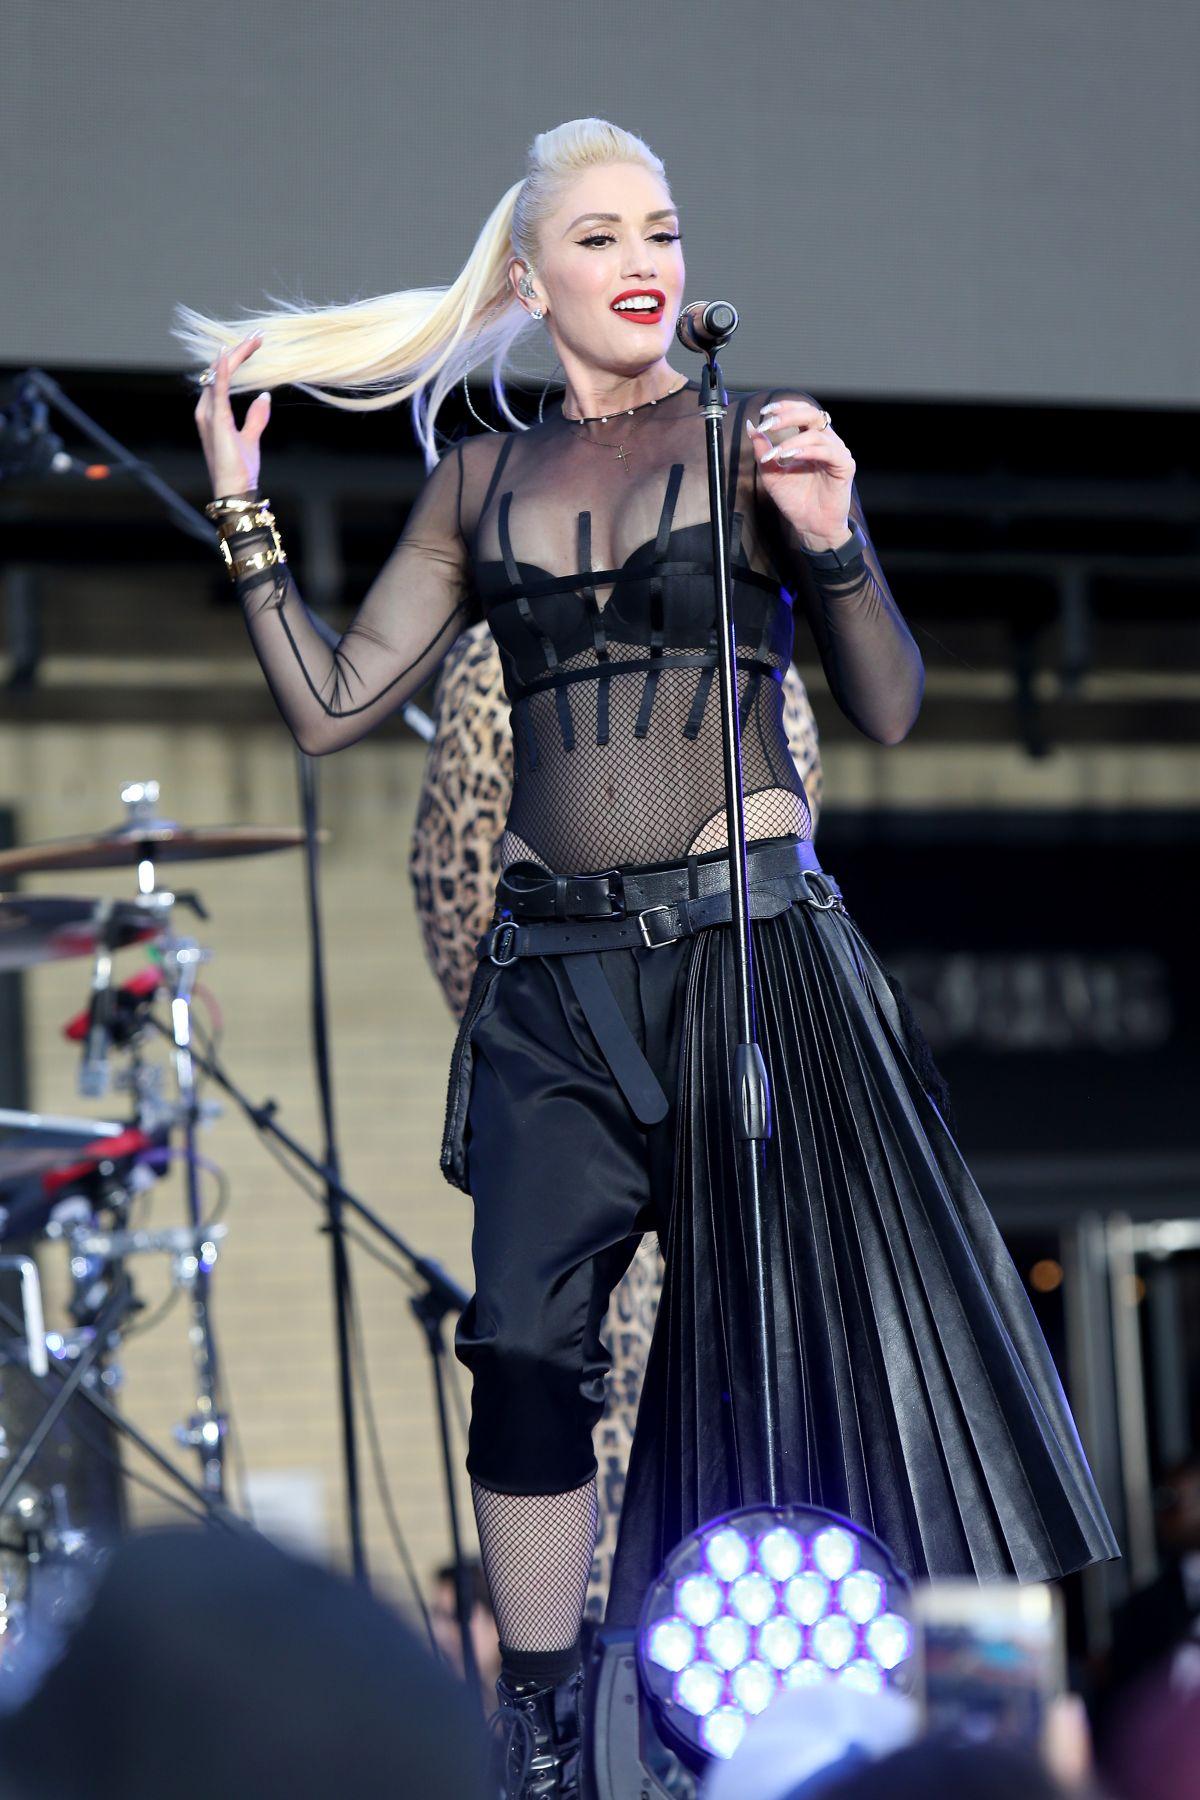 GWEN STEFANI Performs at Samsung 837 in New York 06/02 ...